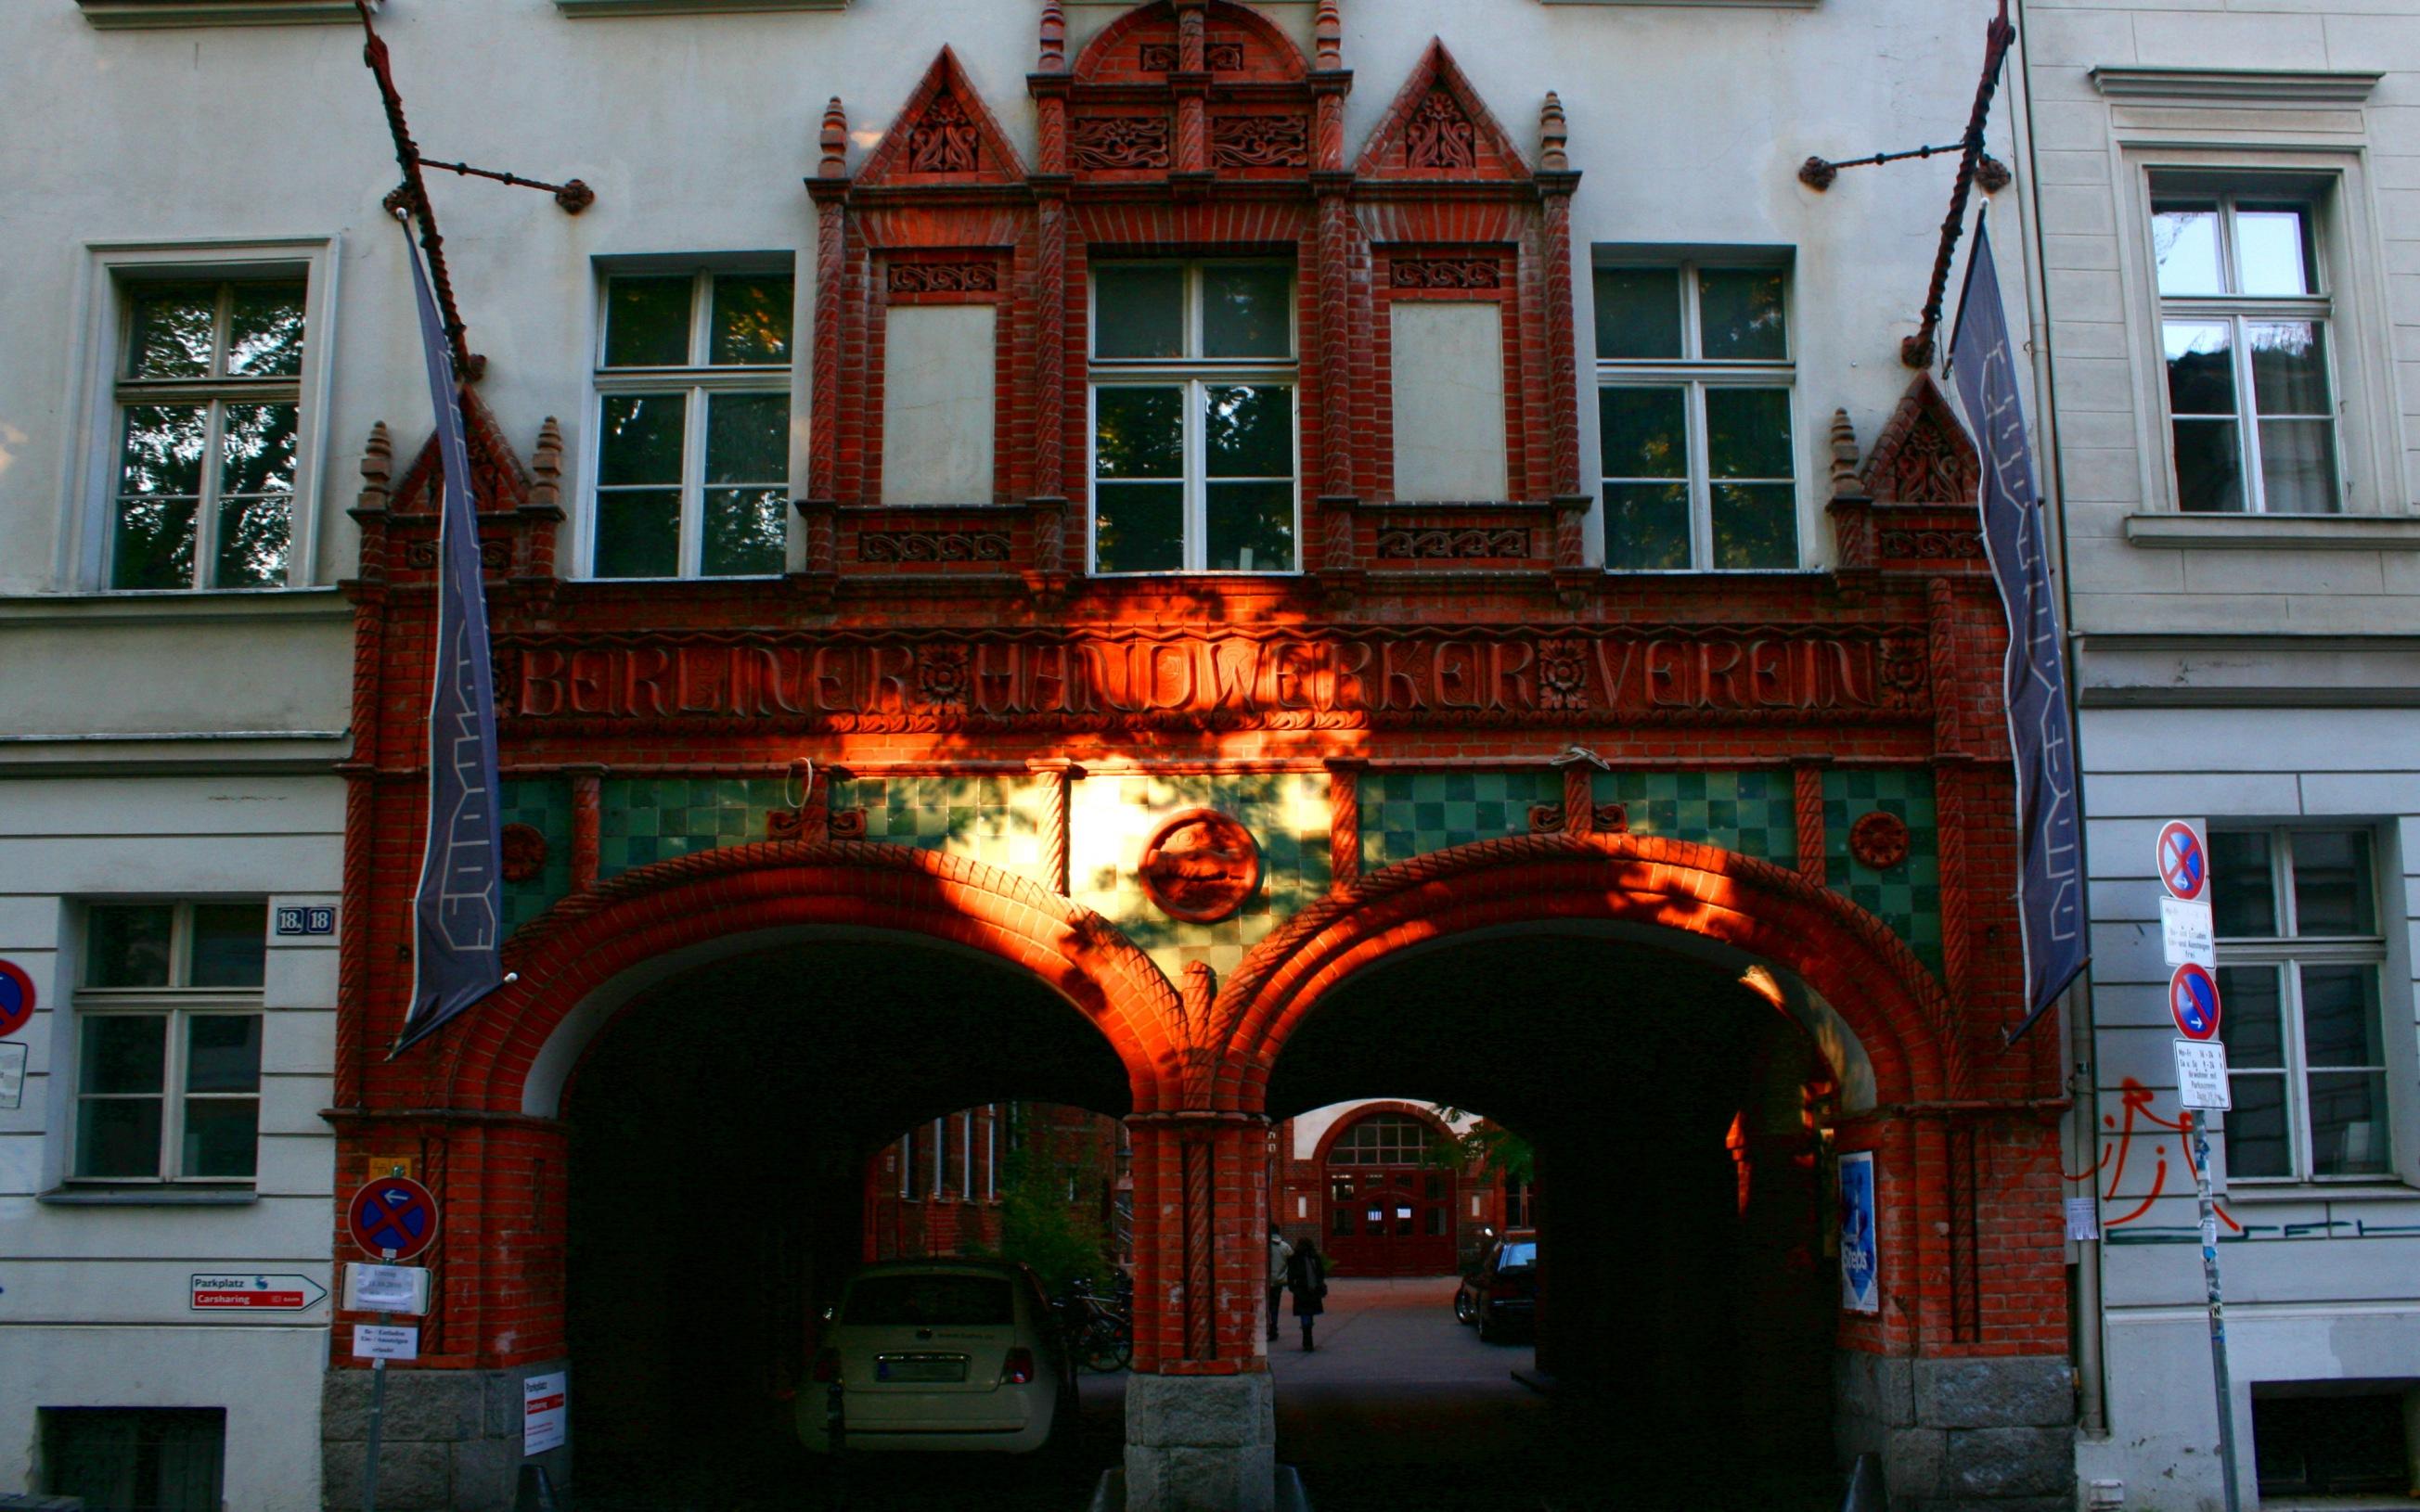 Haupteingang des Handwerkervereinshauses (Sophienstraße, Berlin-Mitte), das die Sophiensaele beheimatet